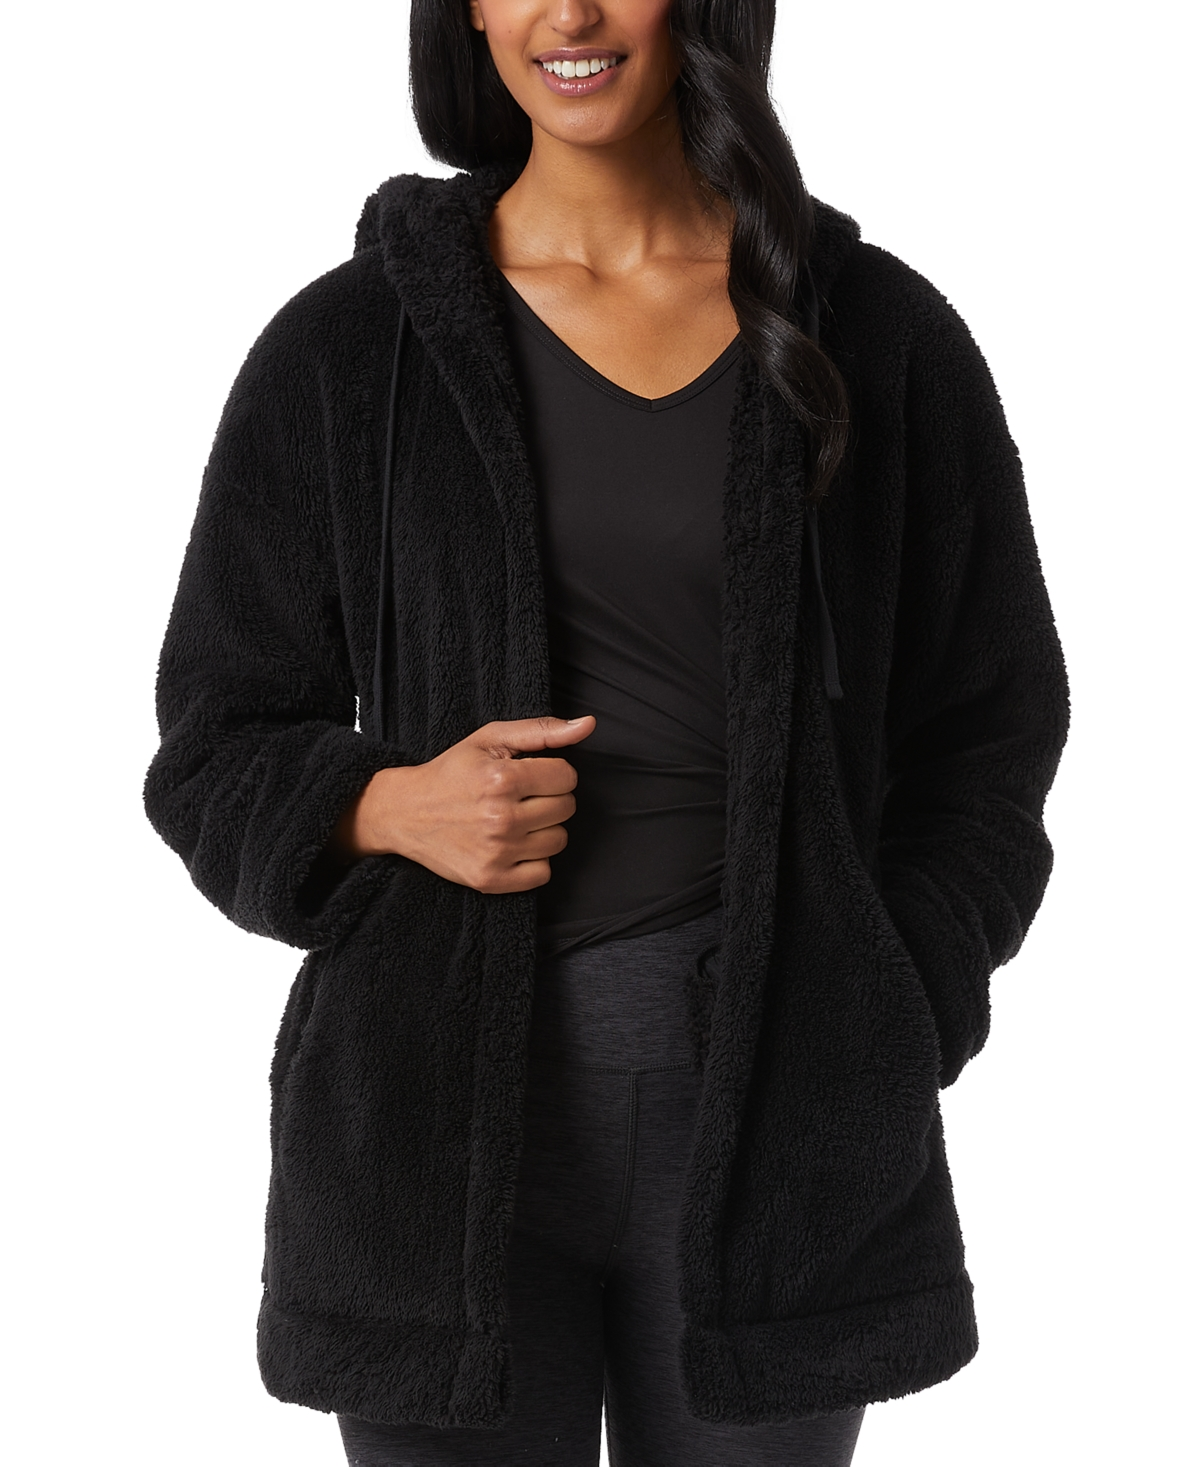 32 Degrees Sherpa Hooded Cardigan